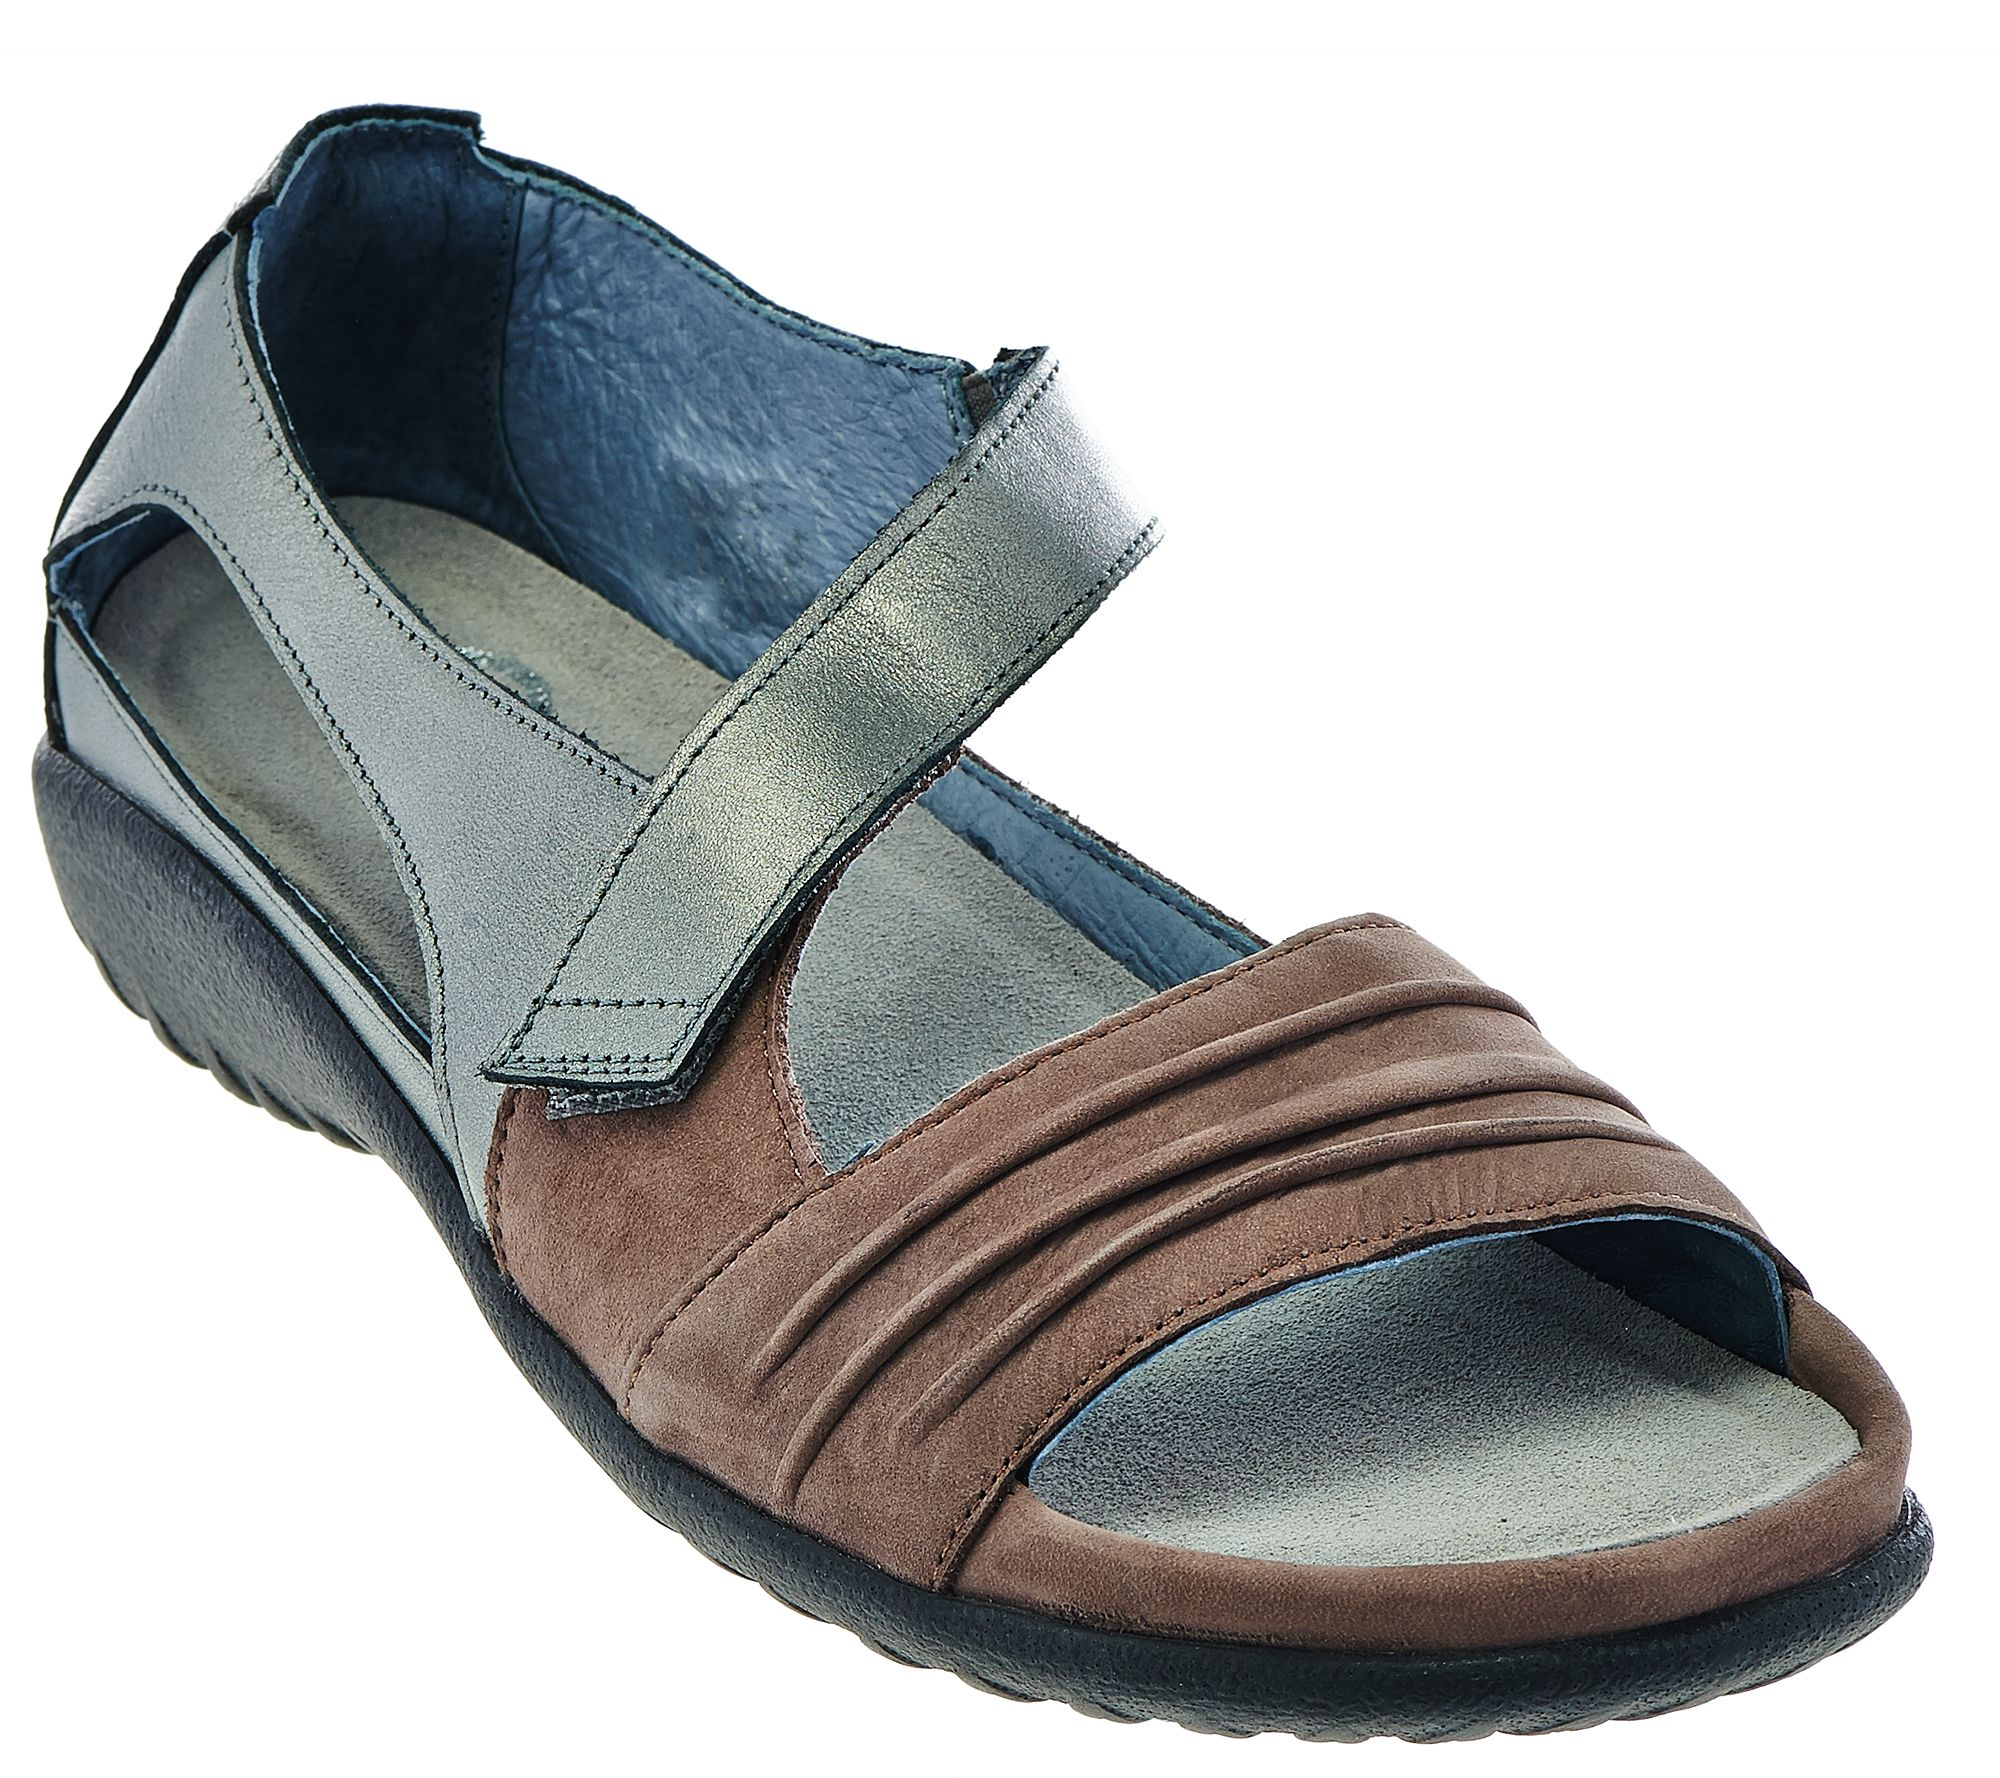 Naot Nubuck Leather Closed Back Sandals - Papaki - Page 1 — QVC.com c6136a36938